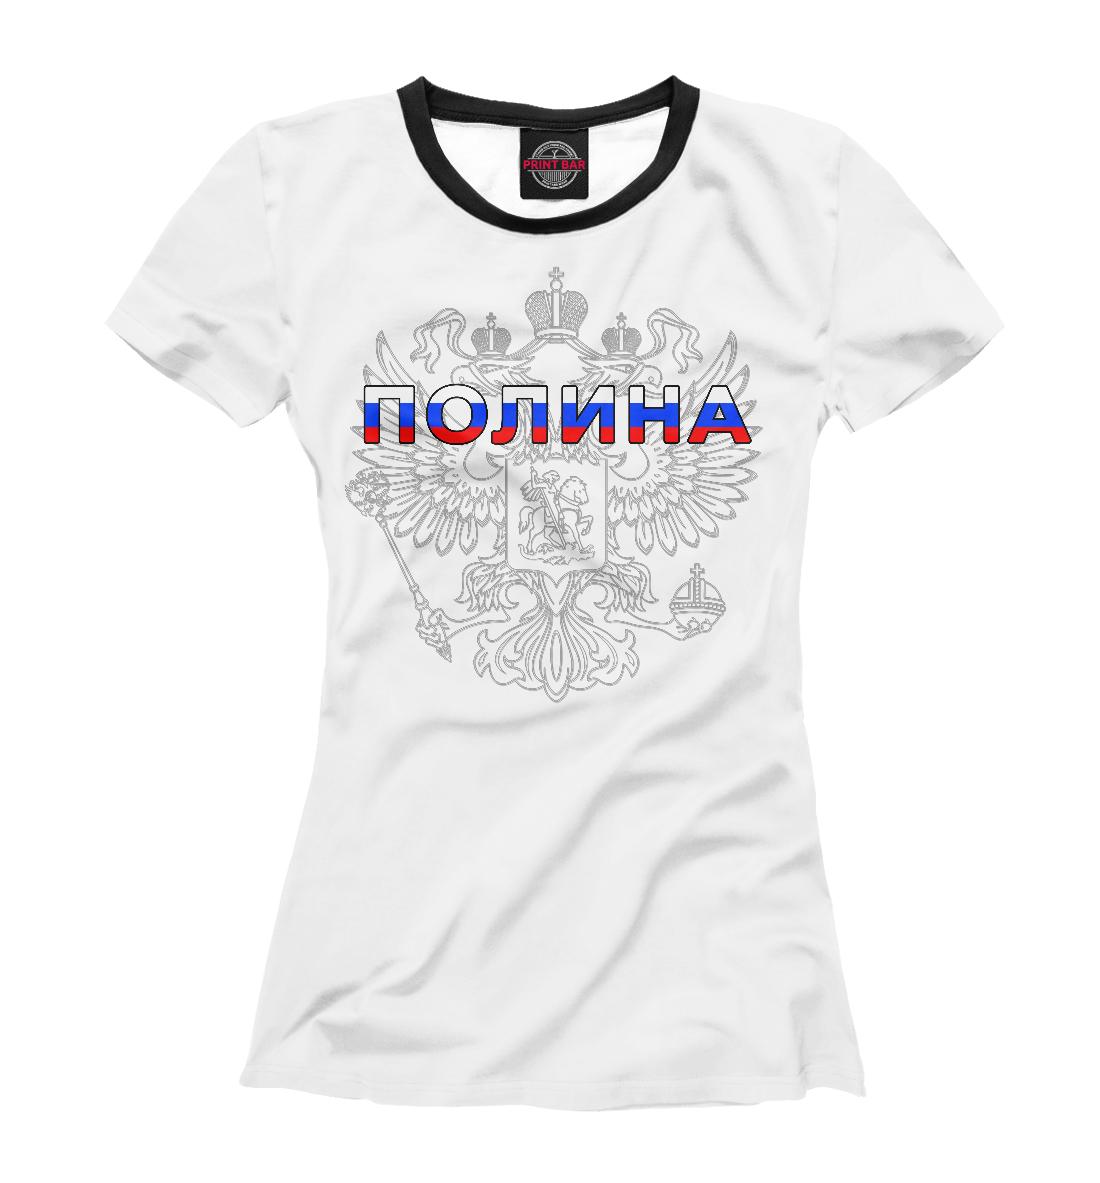 Купить Полина, Printbar, Футболки, PLN-852718-fut-1